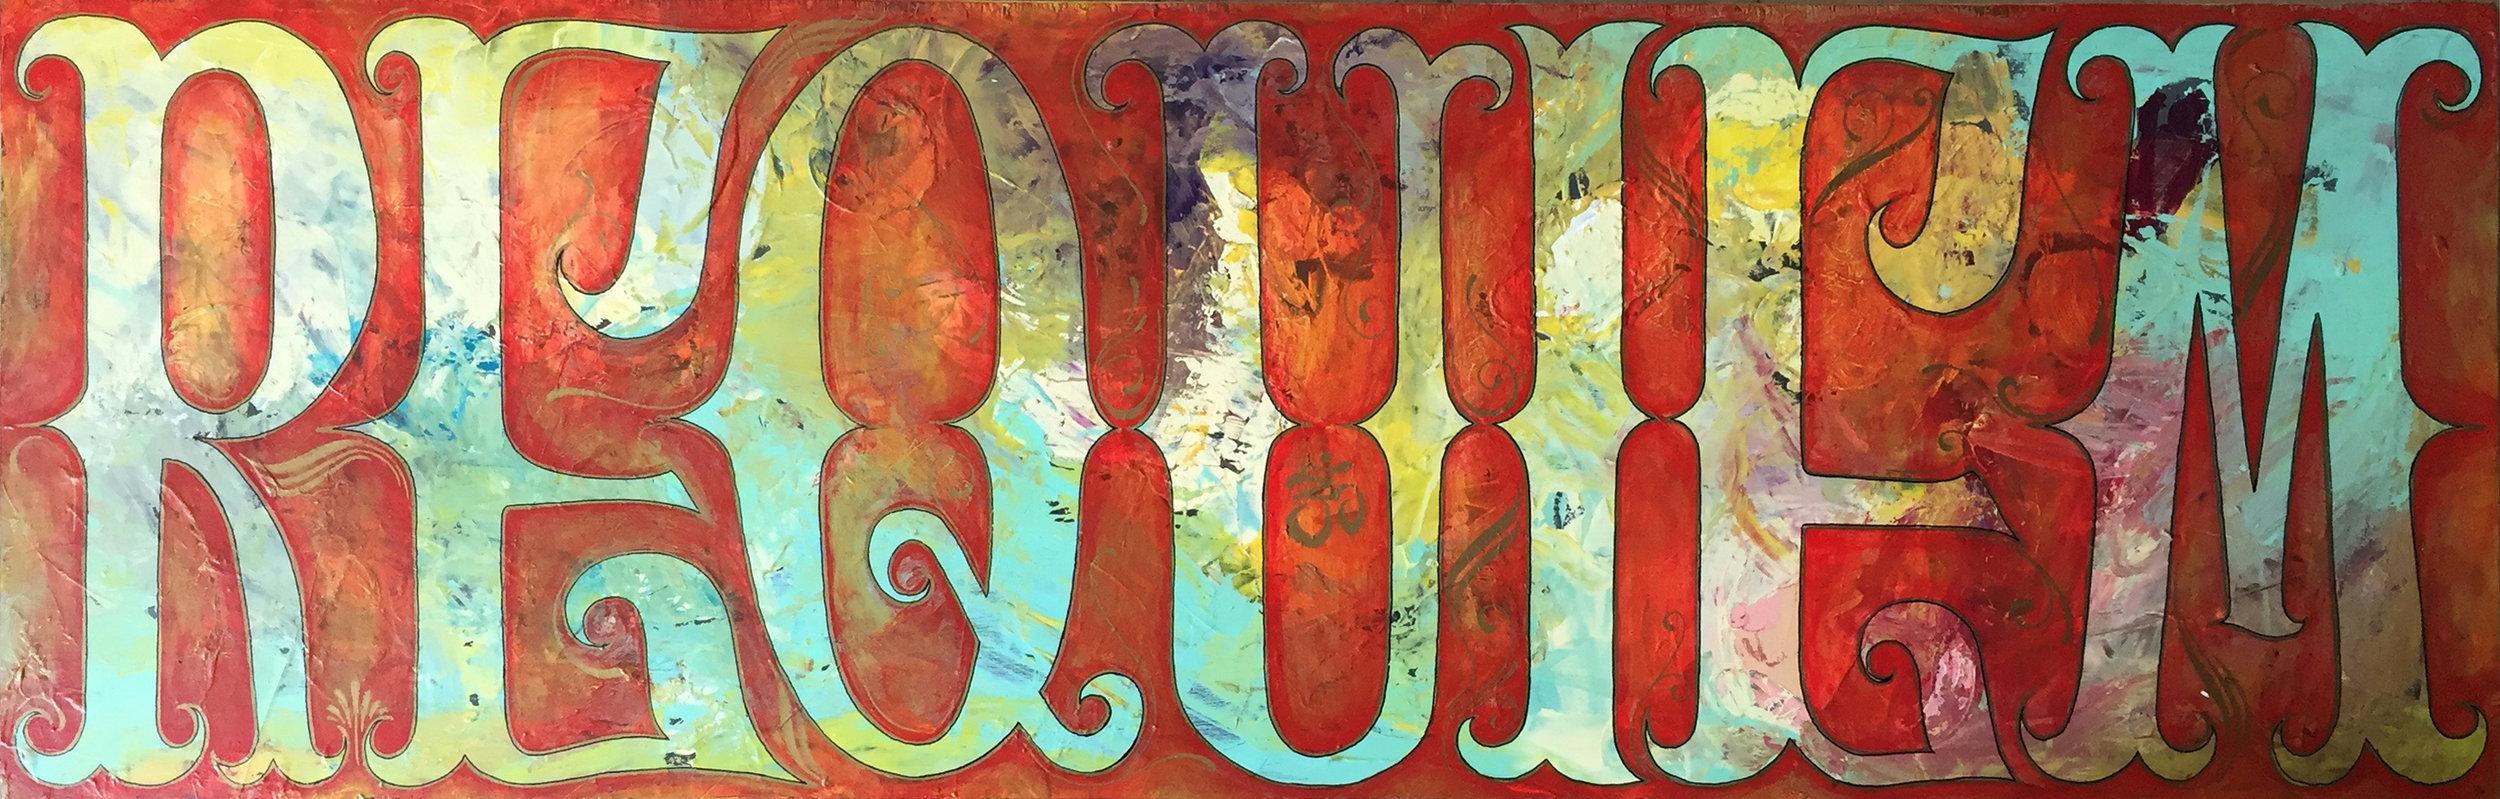 "'Requiem' Acrylic on wood. 48""x16"". 2018"